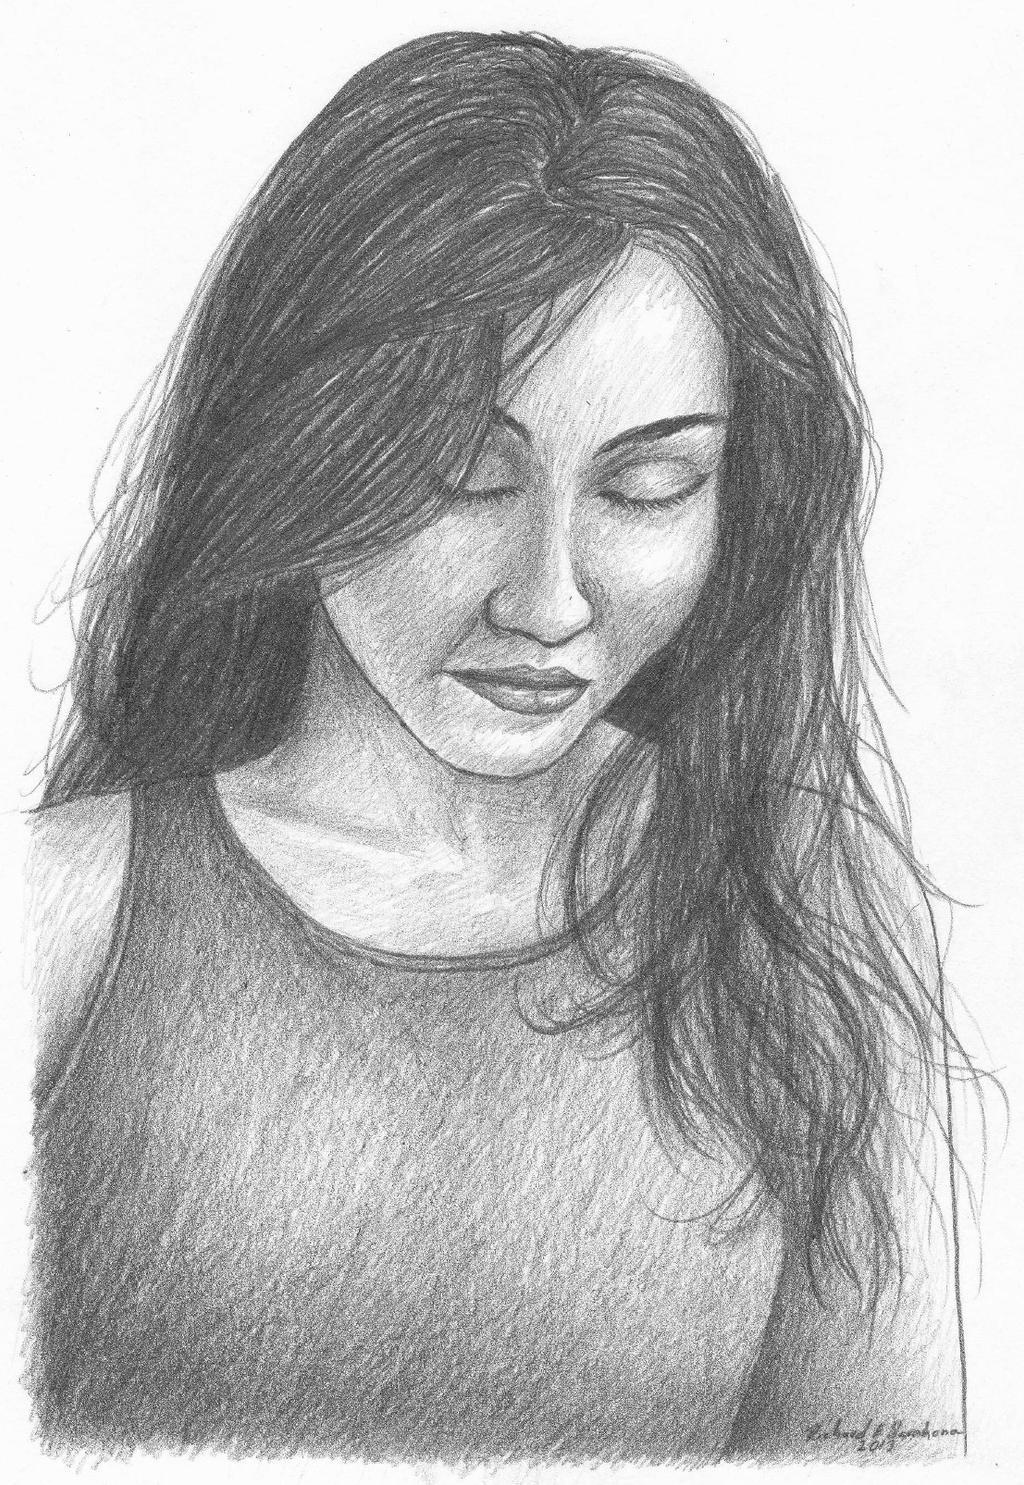 Sad girl sketch by RichardEBarahona on DeviantArt